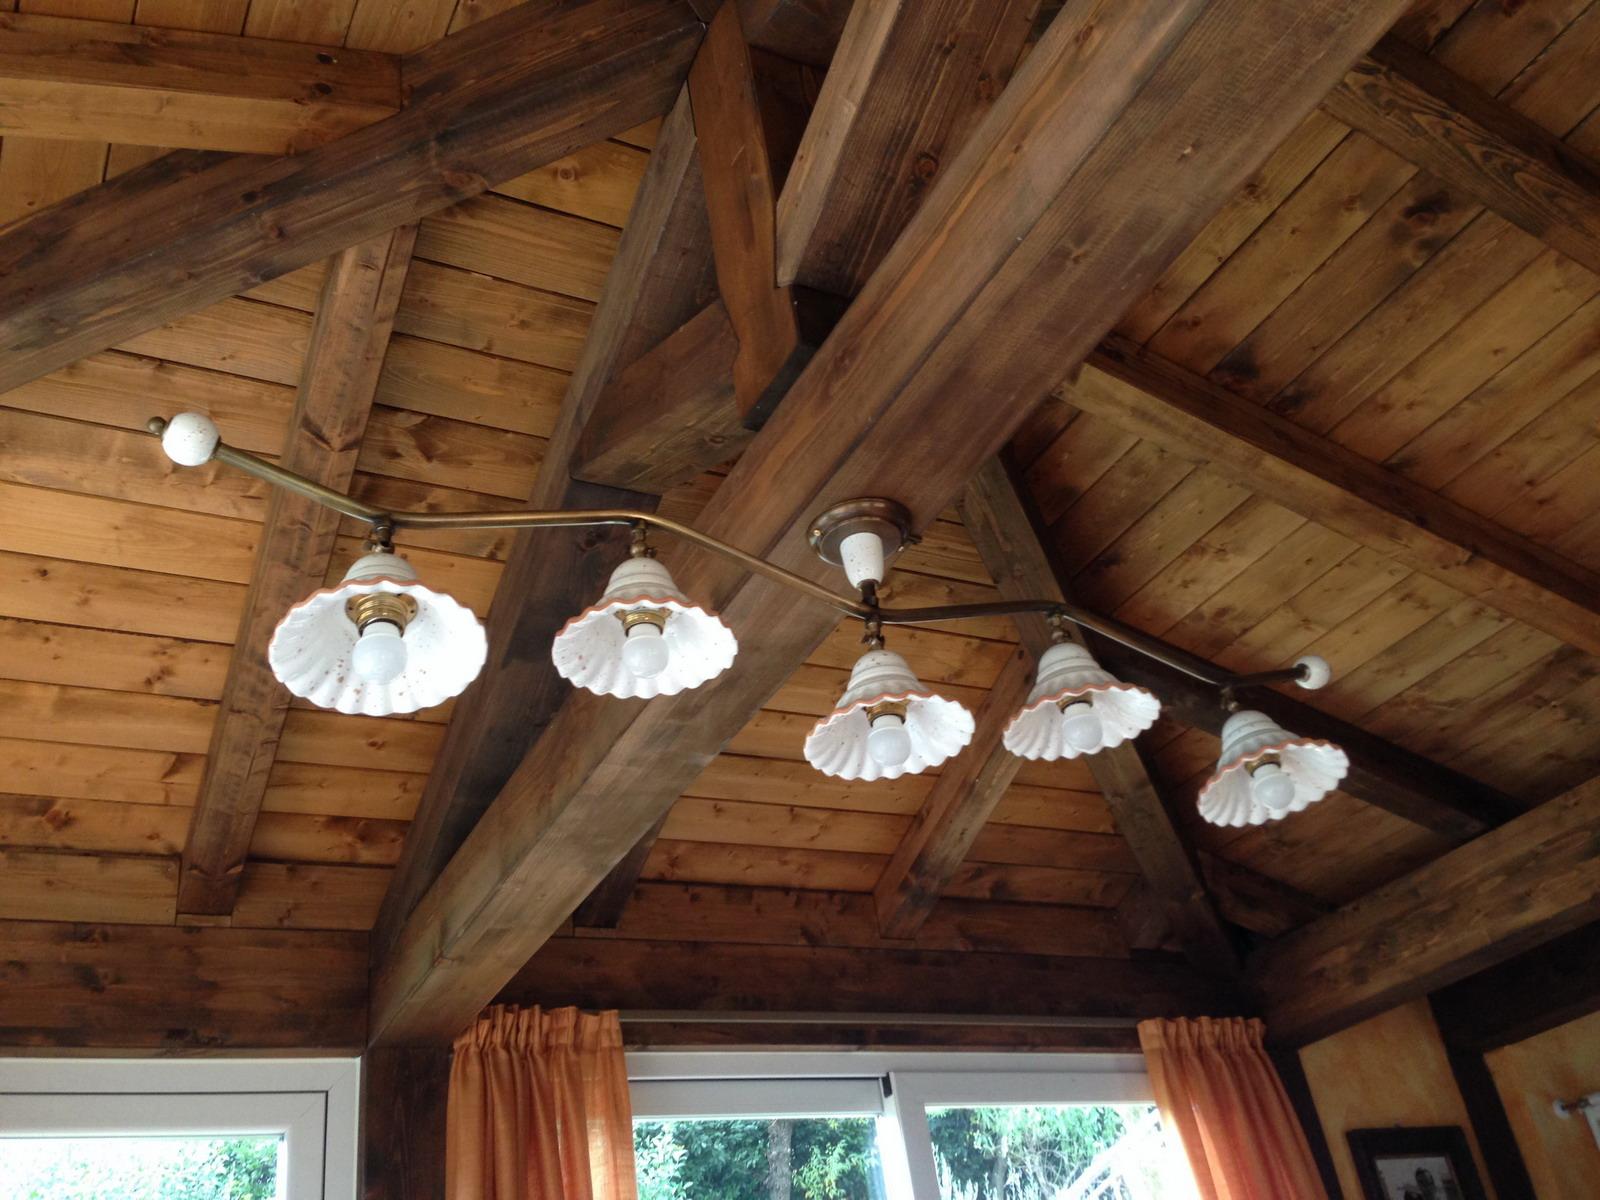 lampadari per taverna : illuminazione ceramica taverna lampadario soffitto tralcio cinque luci